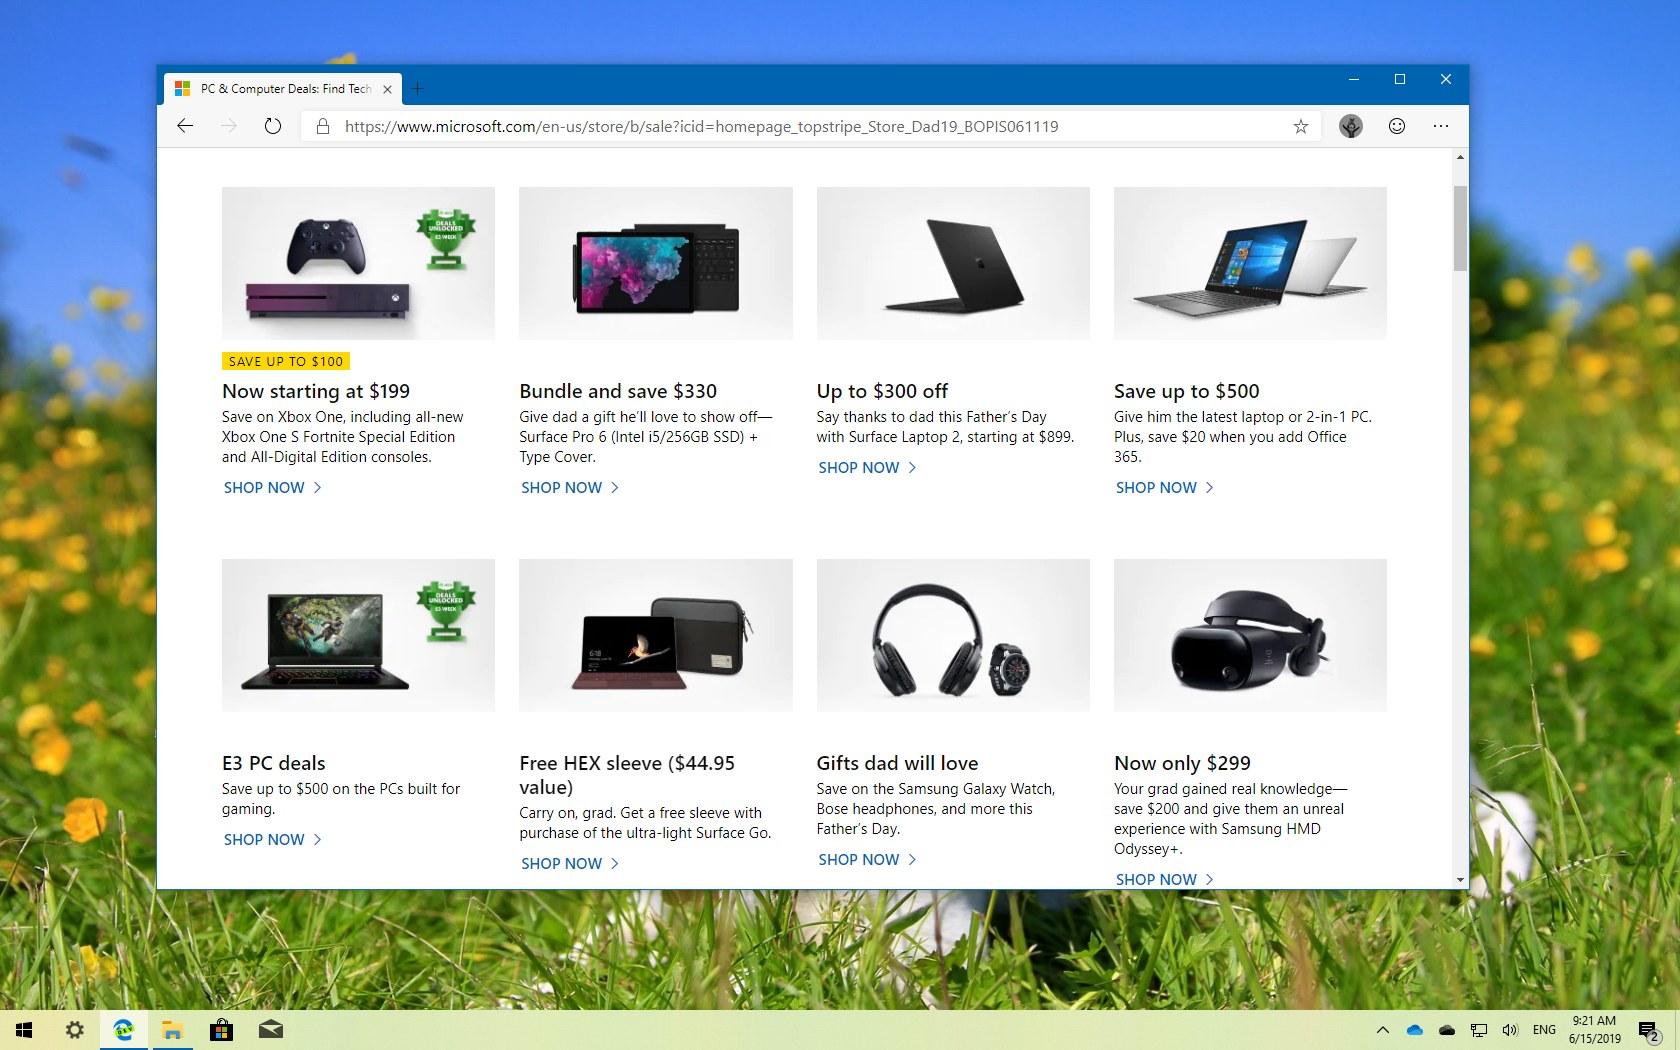 Microsoft Store Father's Day Sale 2019